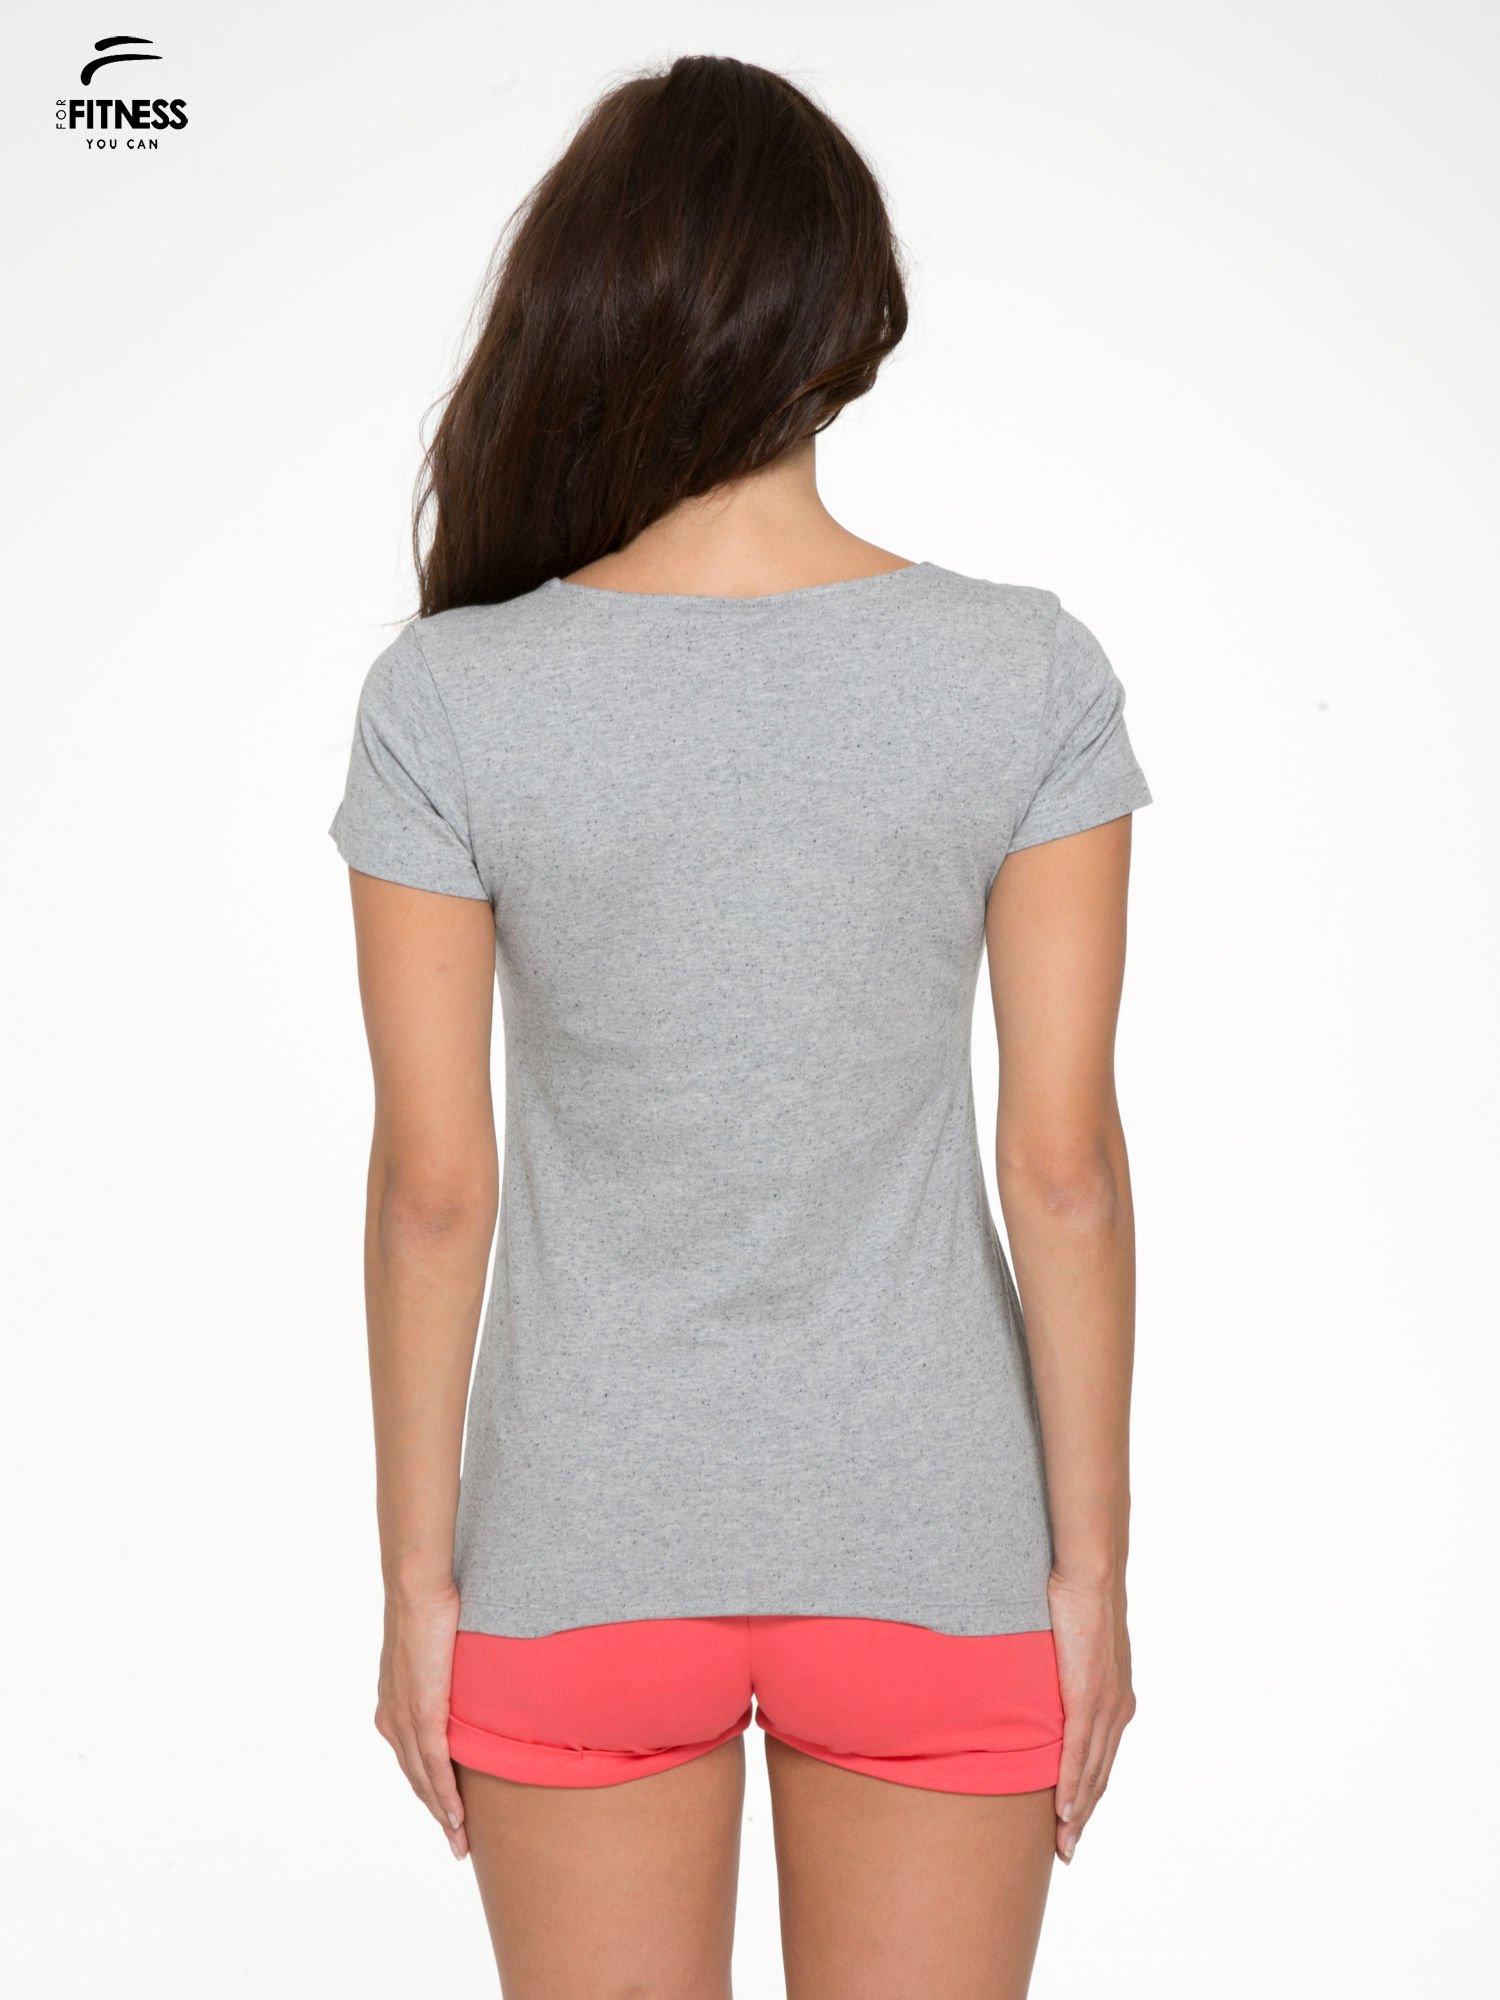 Szary bawełniany t-shirt damski typu basic                                  zdj.                                  4